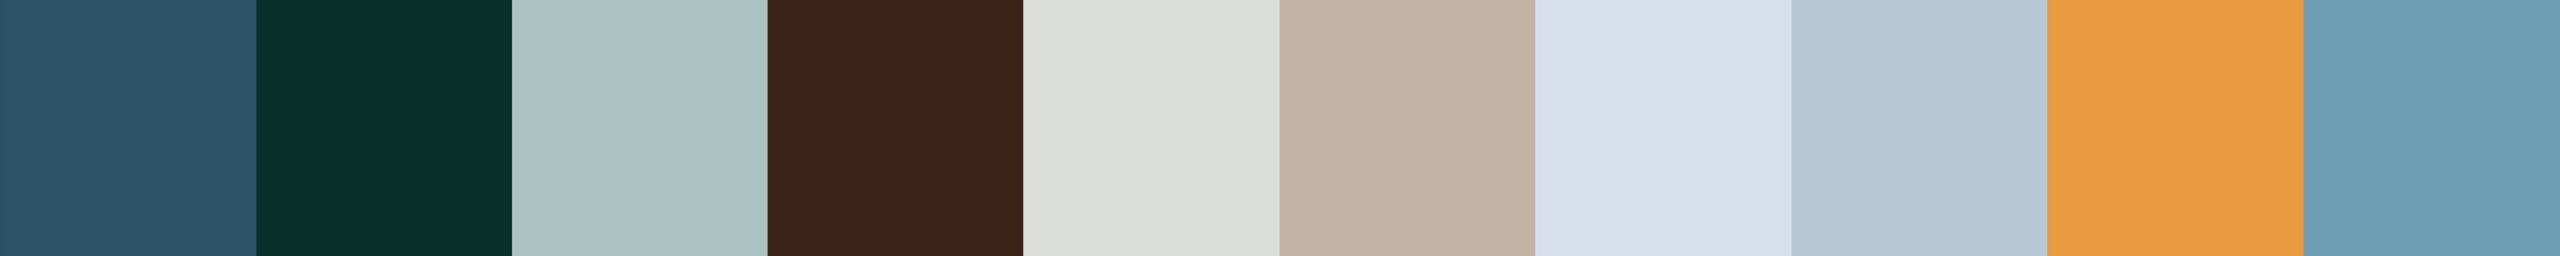 217 Ydrovaria Color Palette